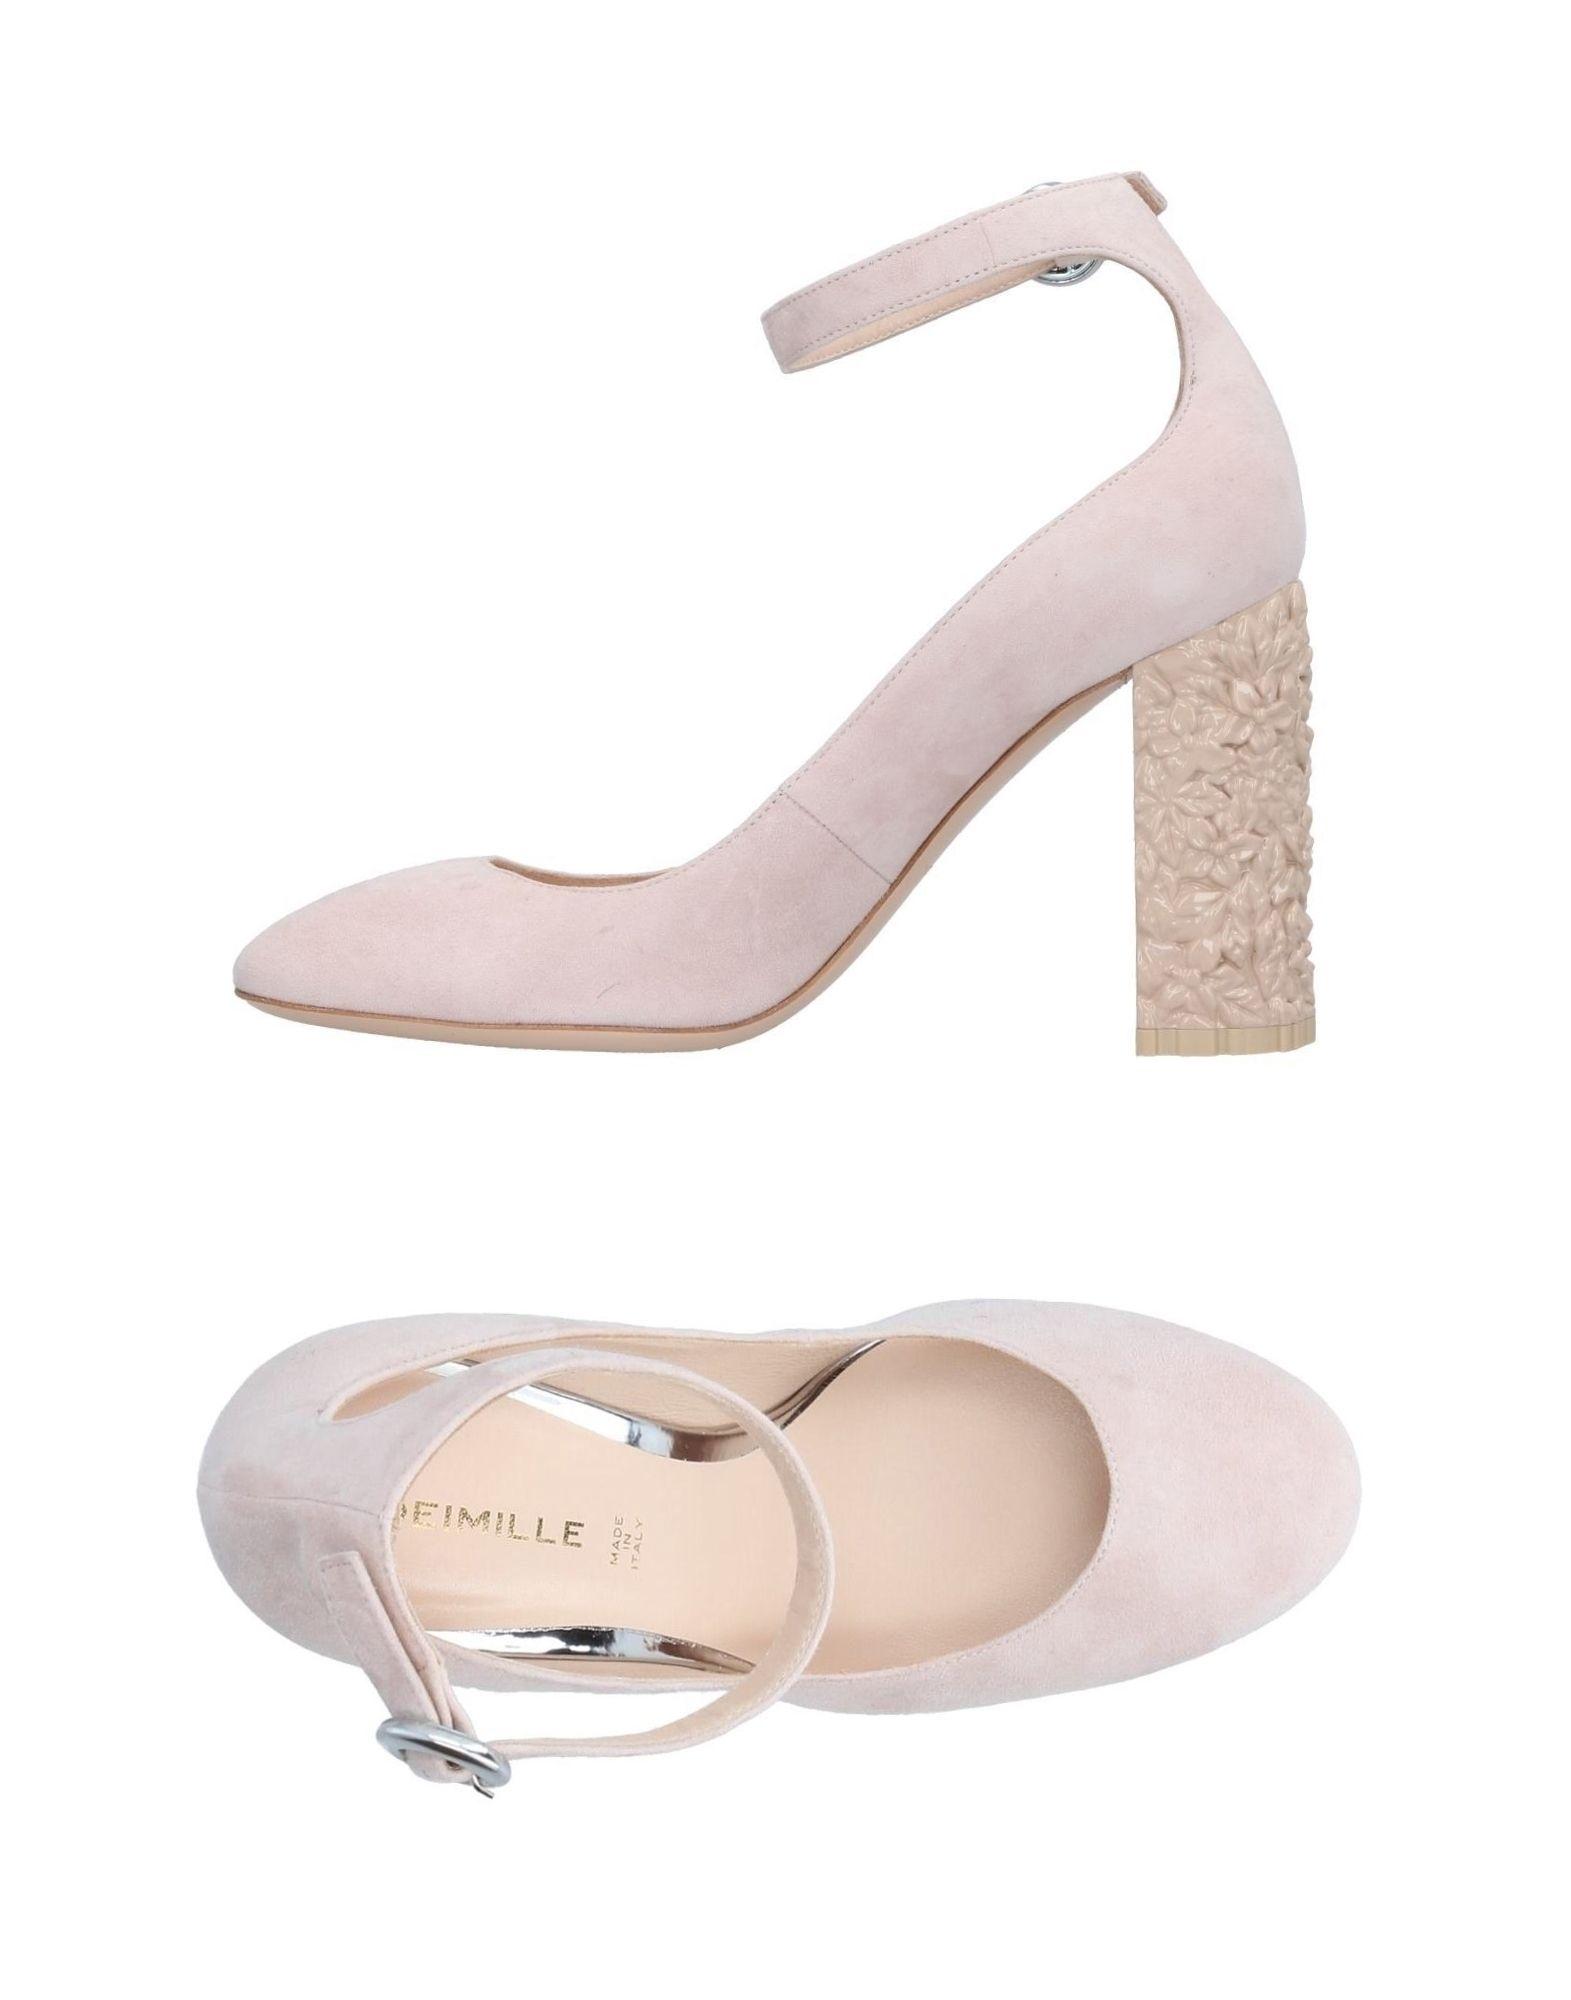 Deimille Pumps Damen  11399652XJ Gute Qualität beliebte Schuhe